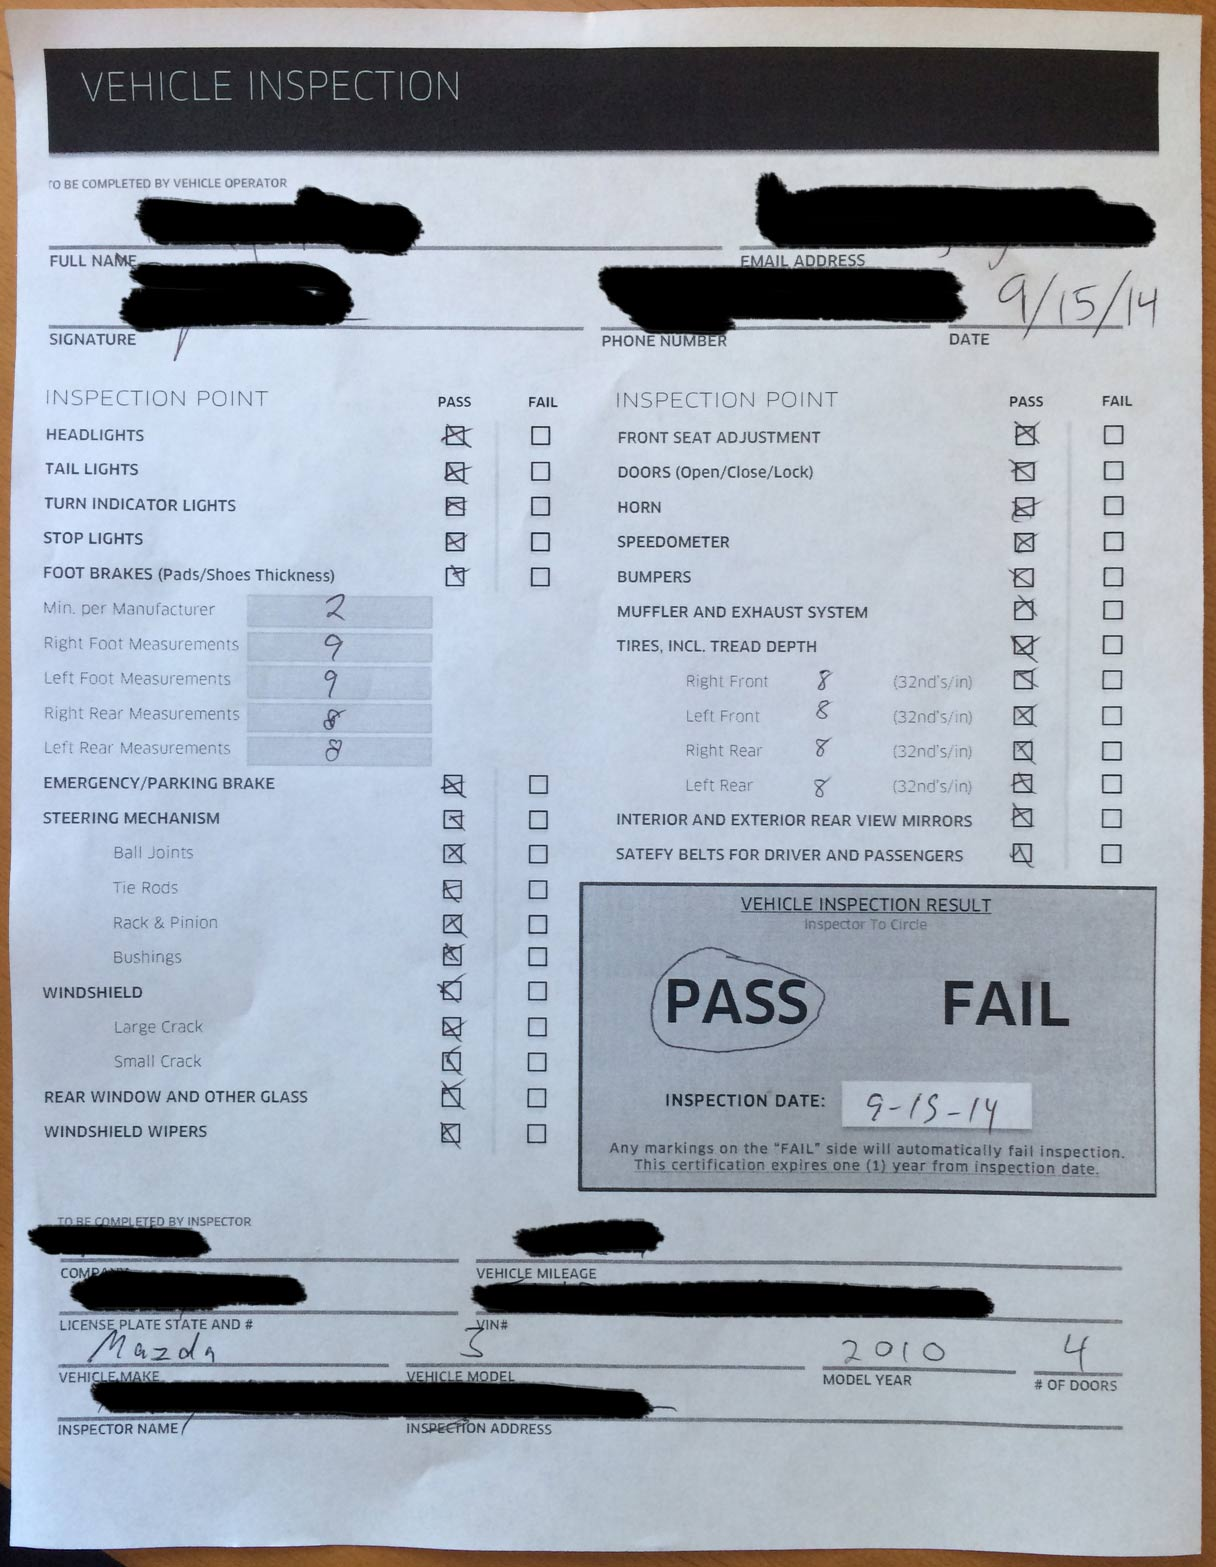 Uber car inspection form toronto 13